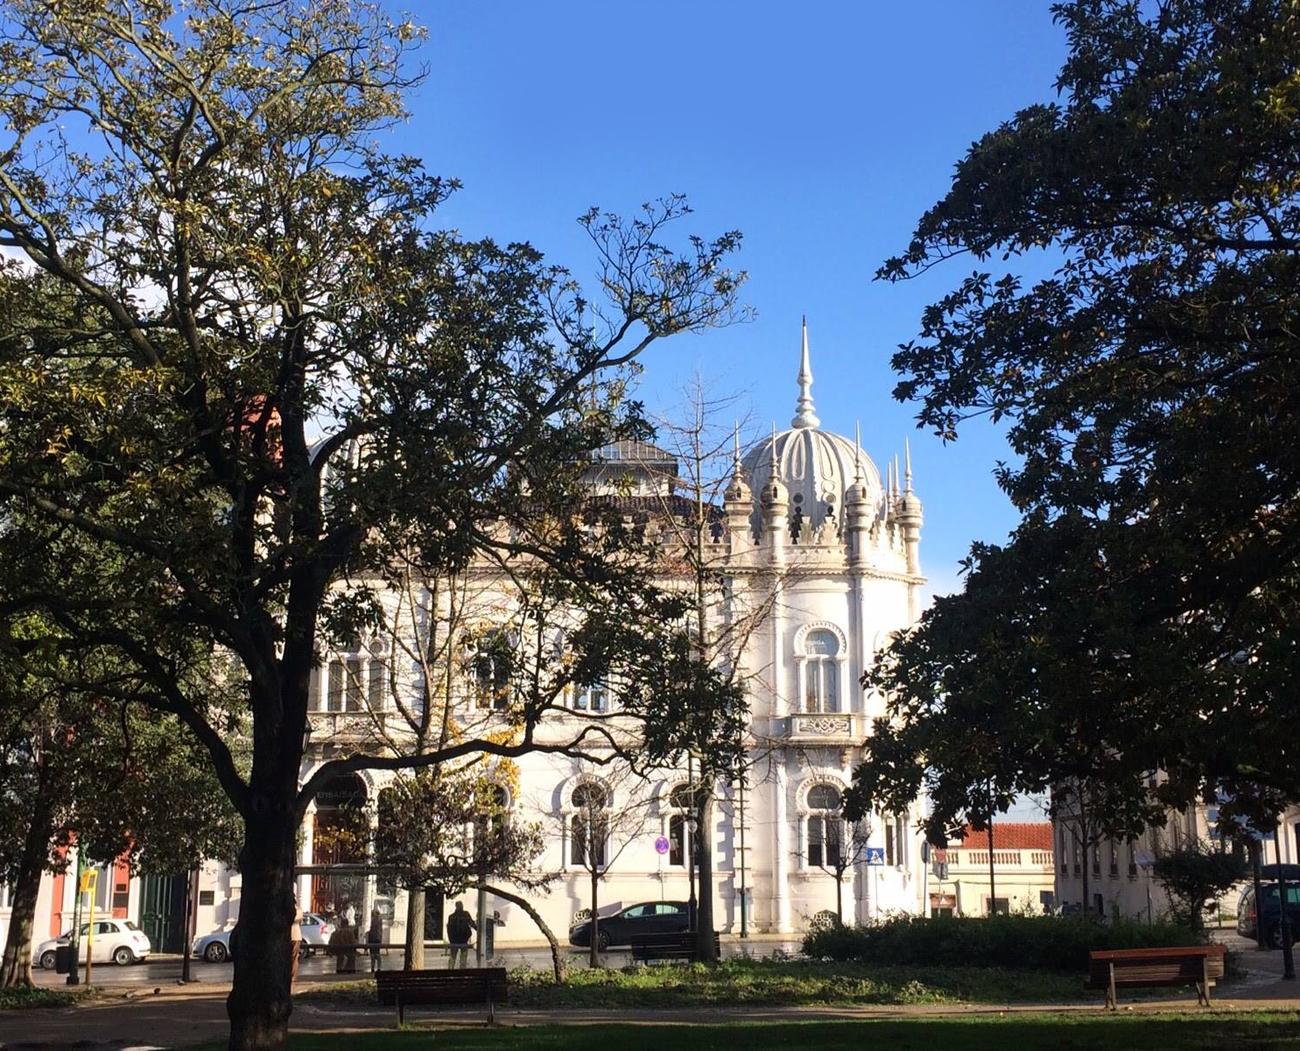 embaixada-principe-real-architecture-lisbonne-lisbon